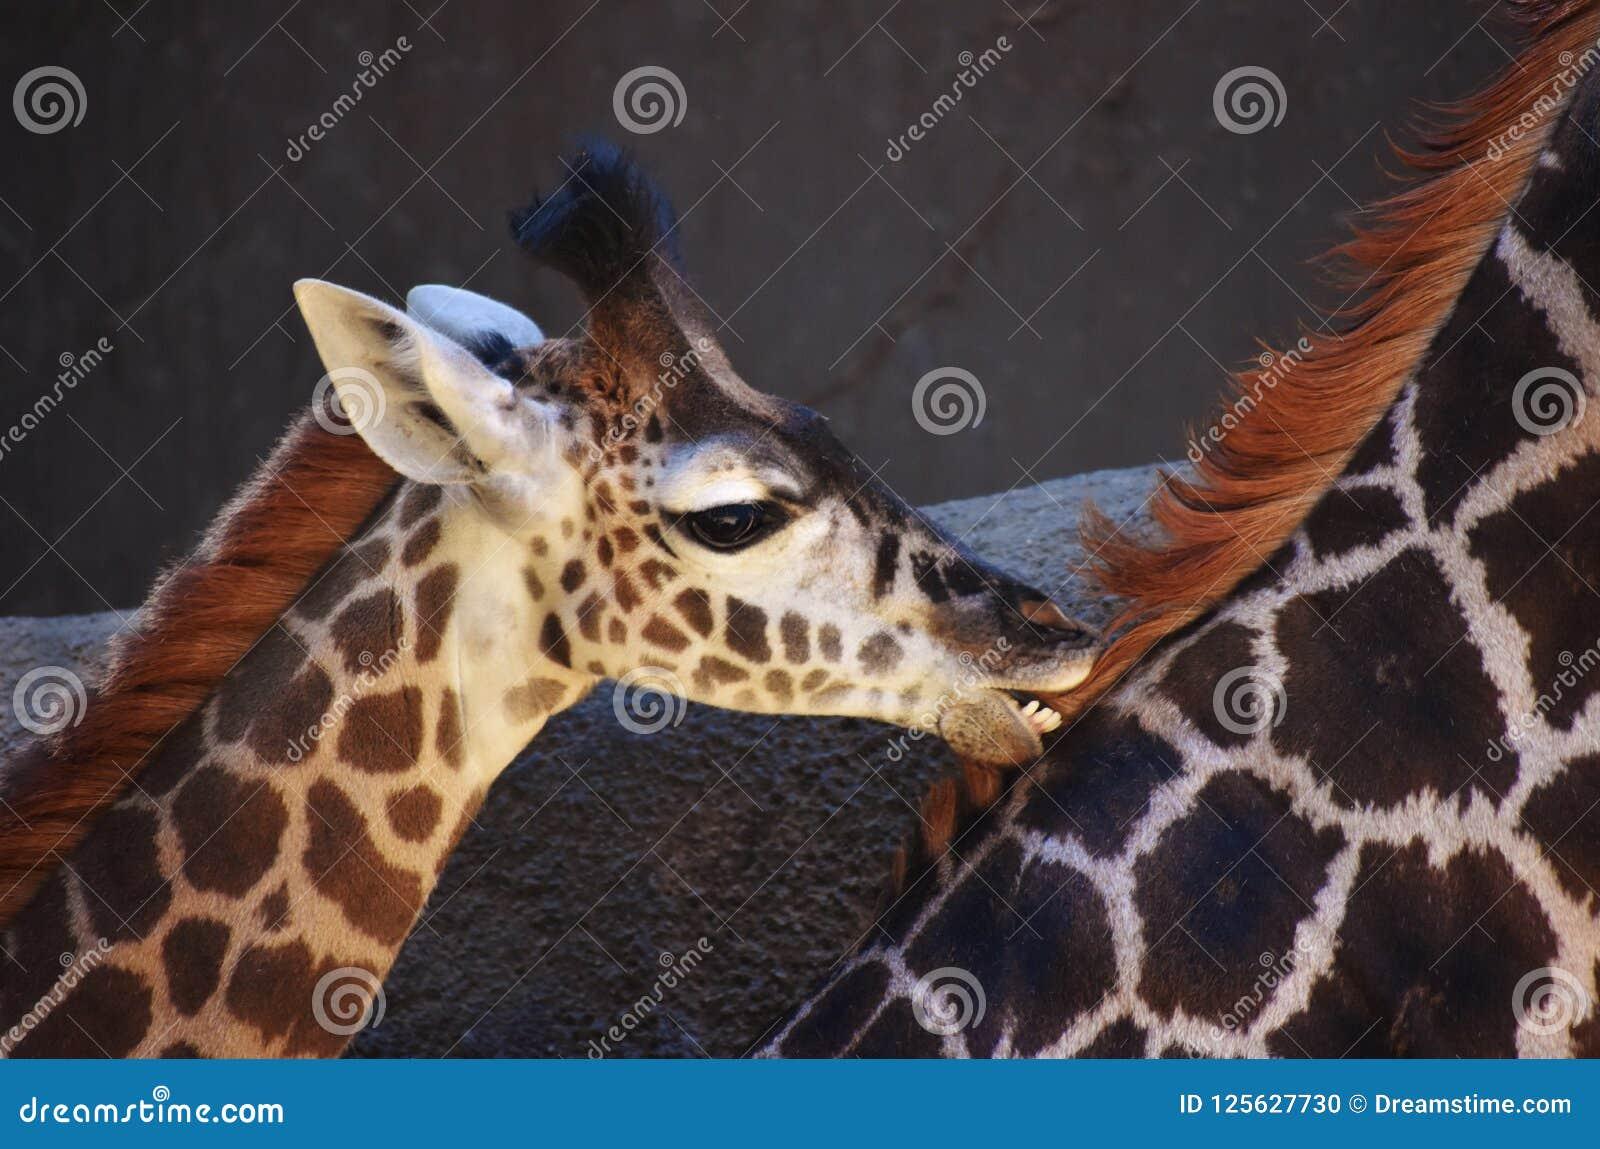 Baby Giraffe Teething